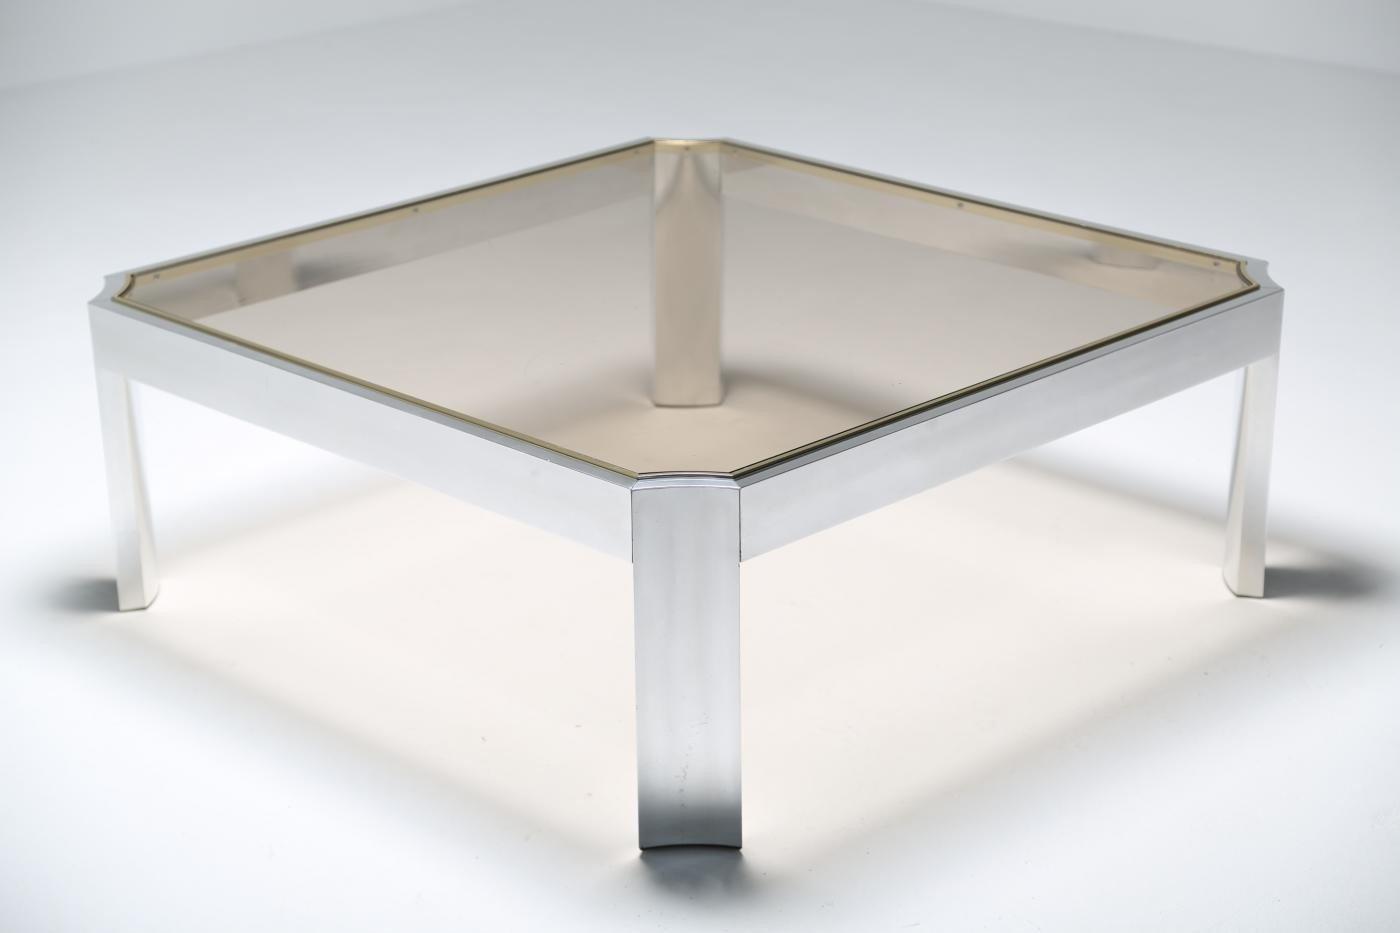 table basse mid century en verre avec socle en aluminium. Black Bedroom Furniture Sets. Home Design Ideas